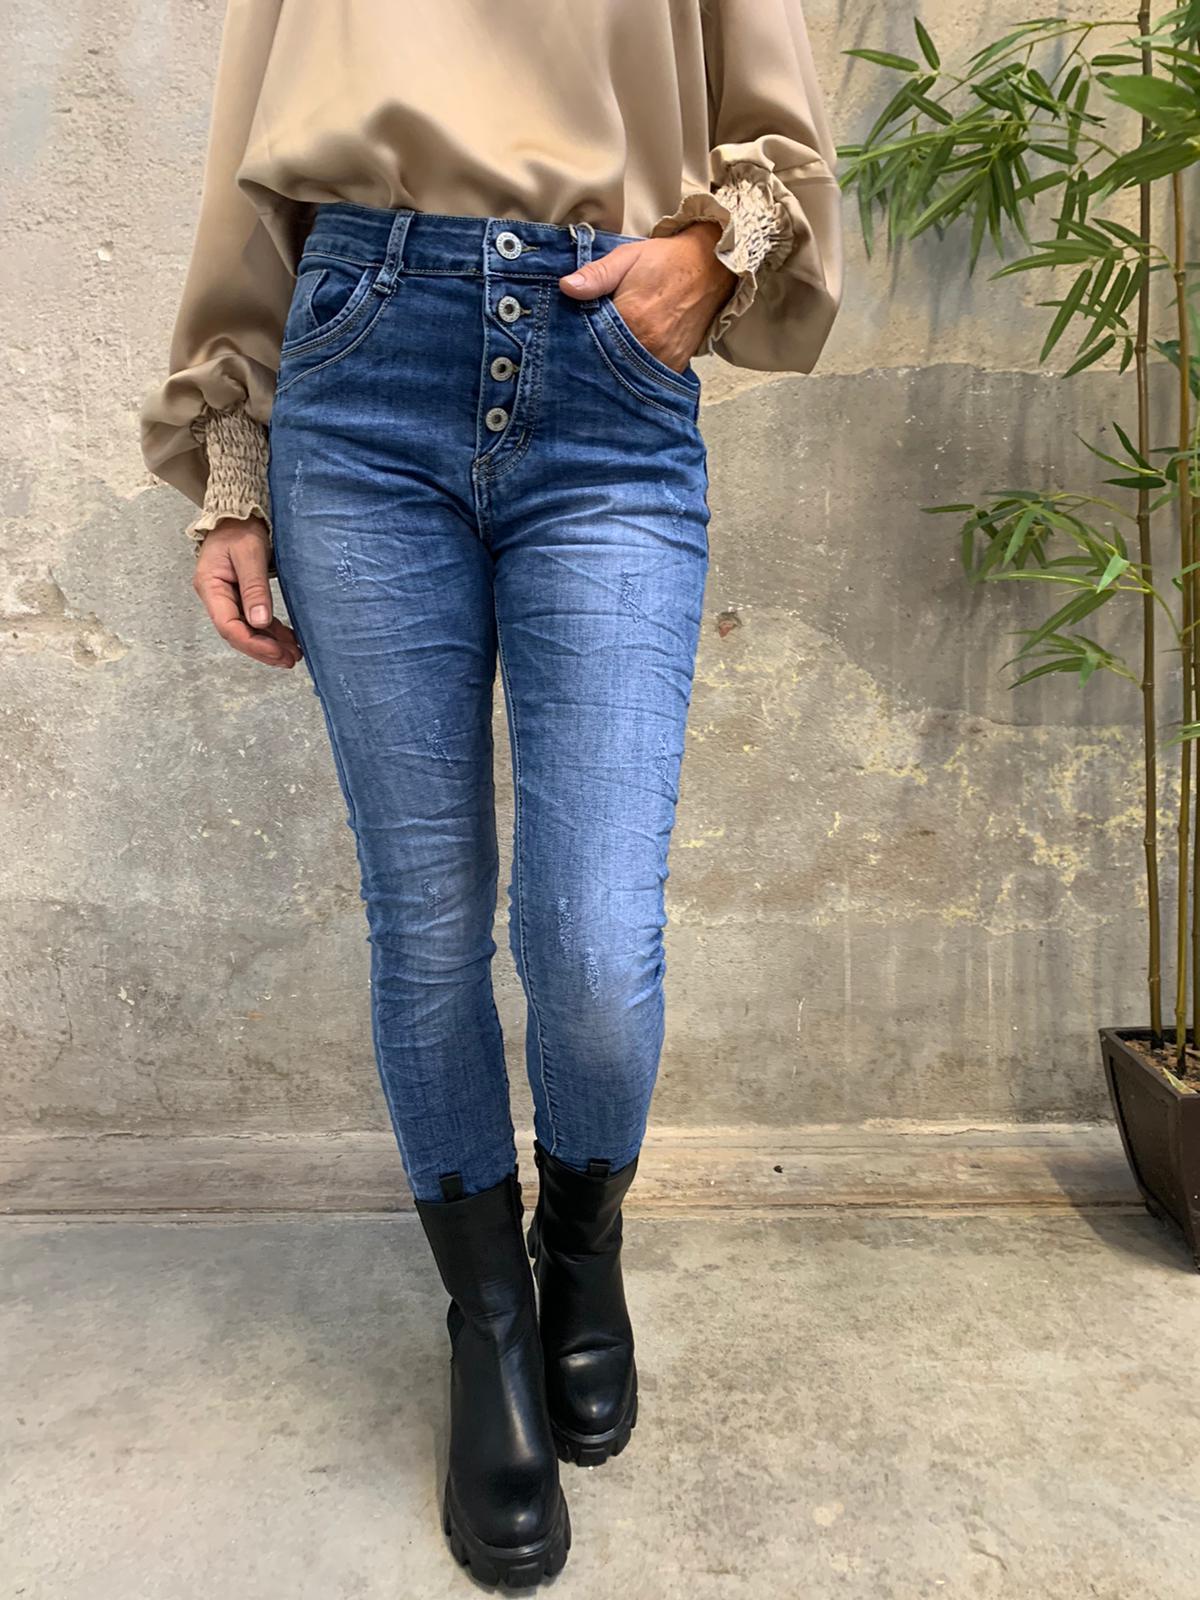 Jeans JW2648 - Denim fram 2